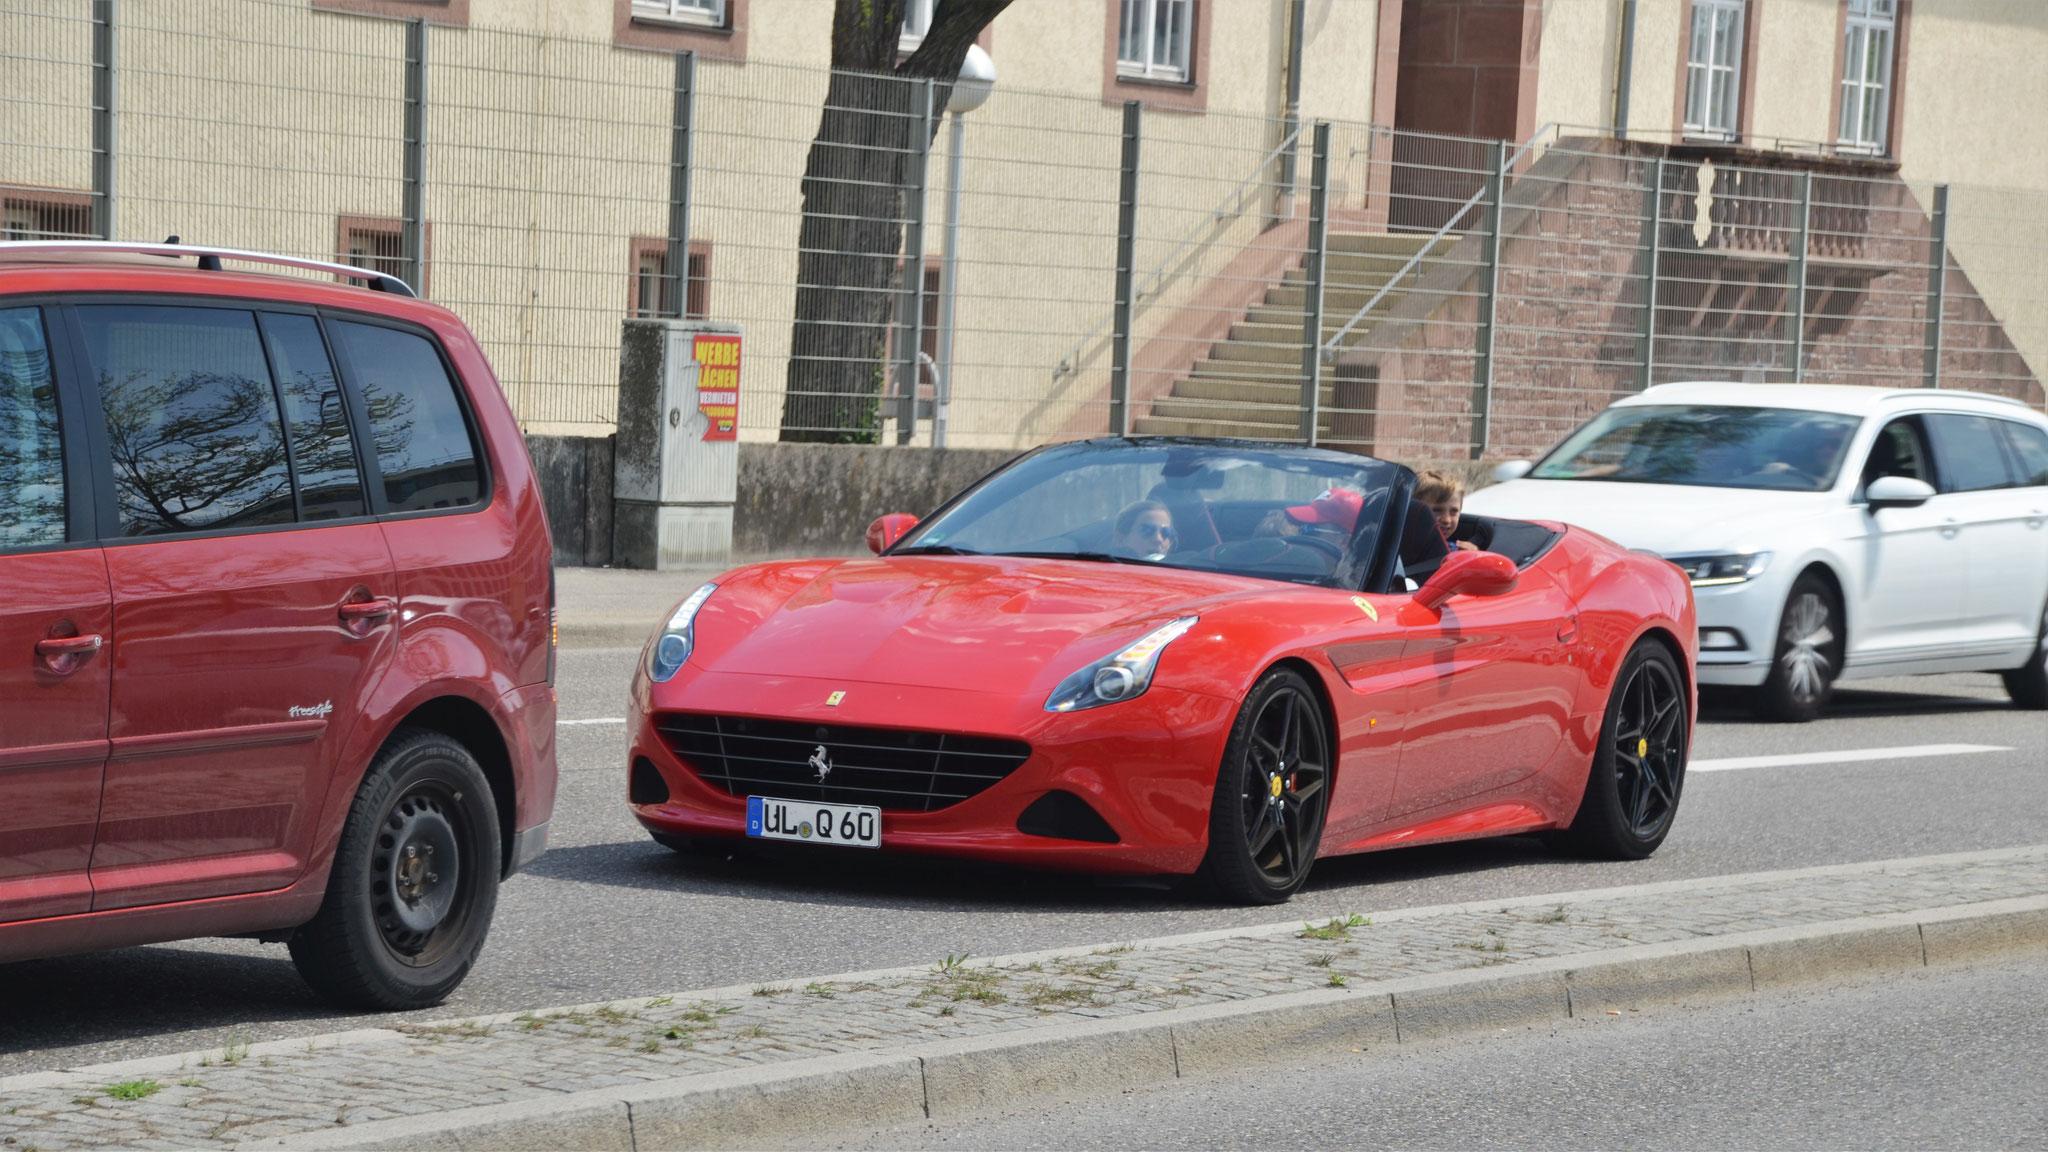 Ferrari California T - UL-Q-60